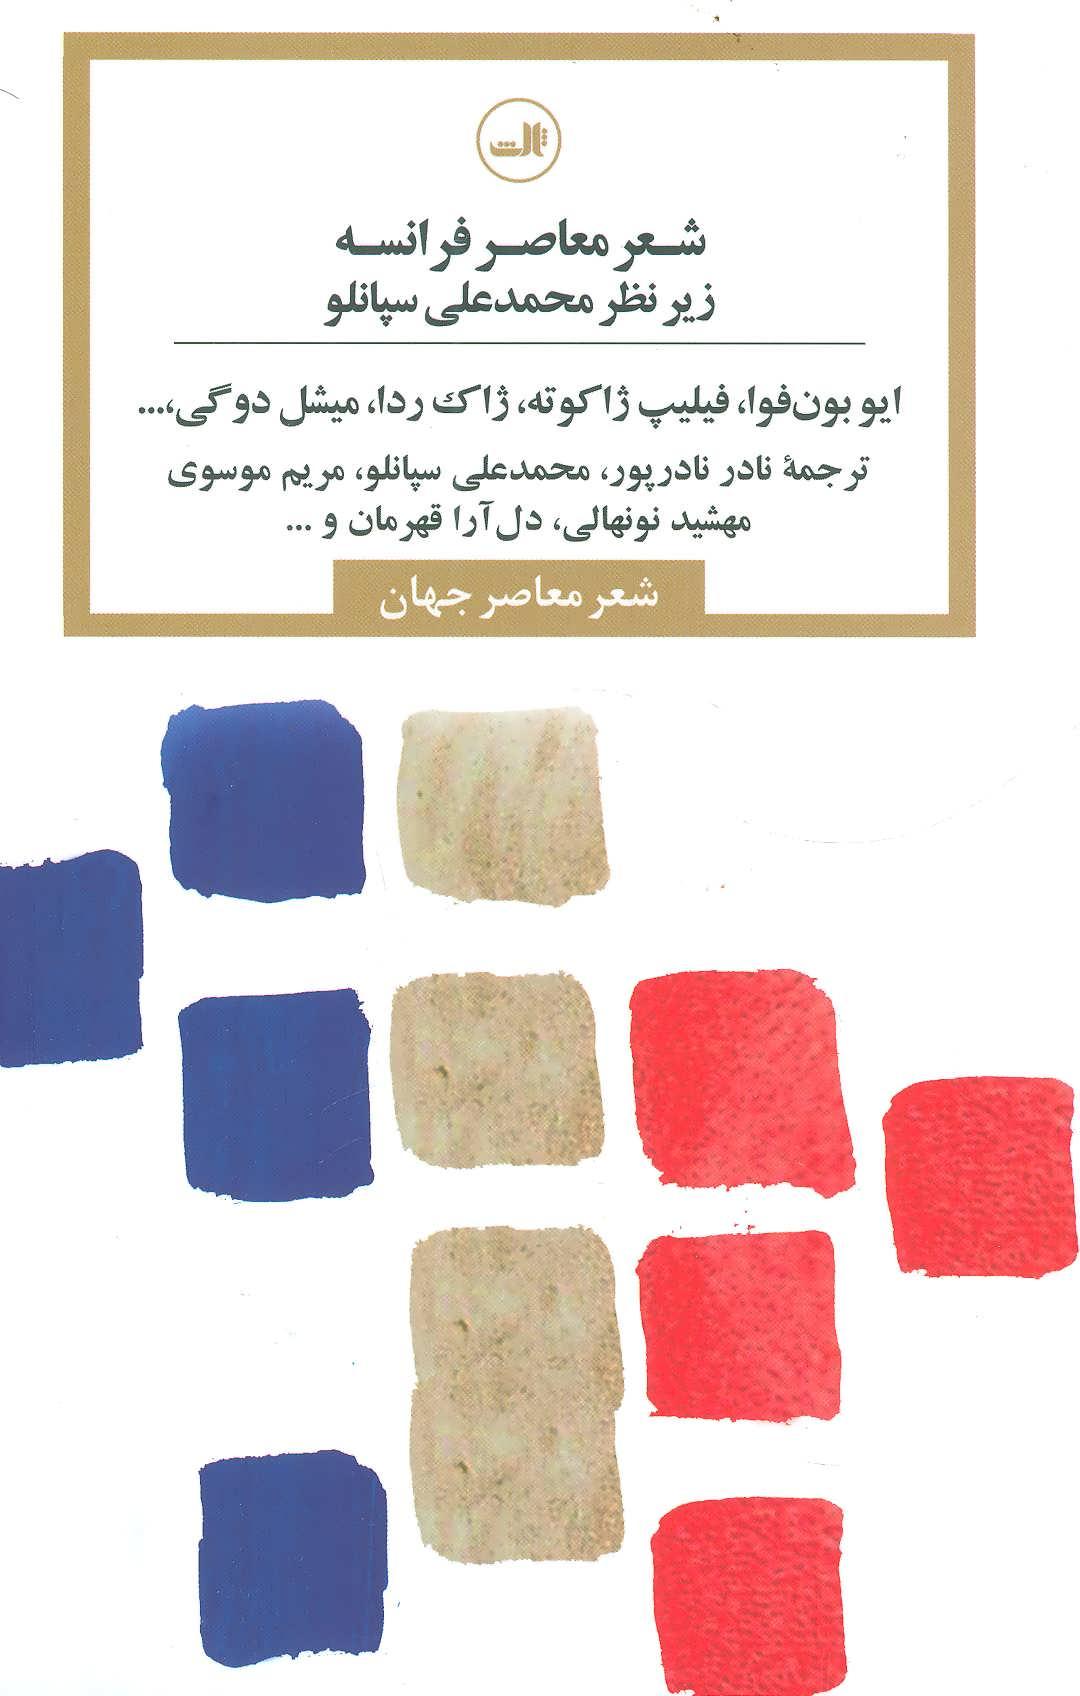 کتاب شعر معاصر فرانسه